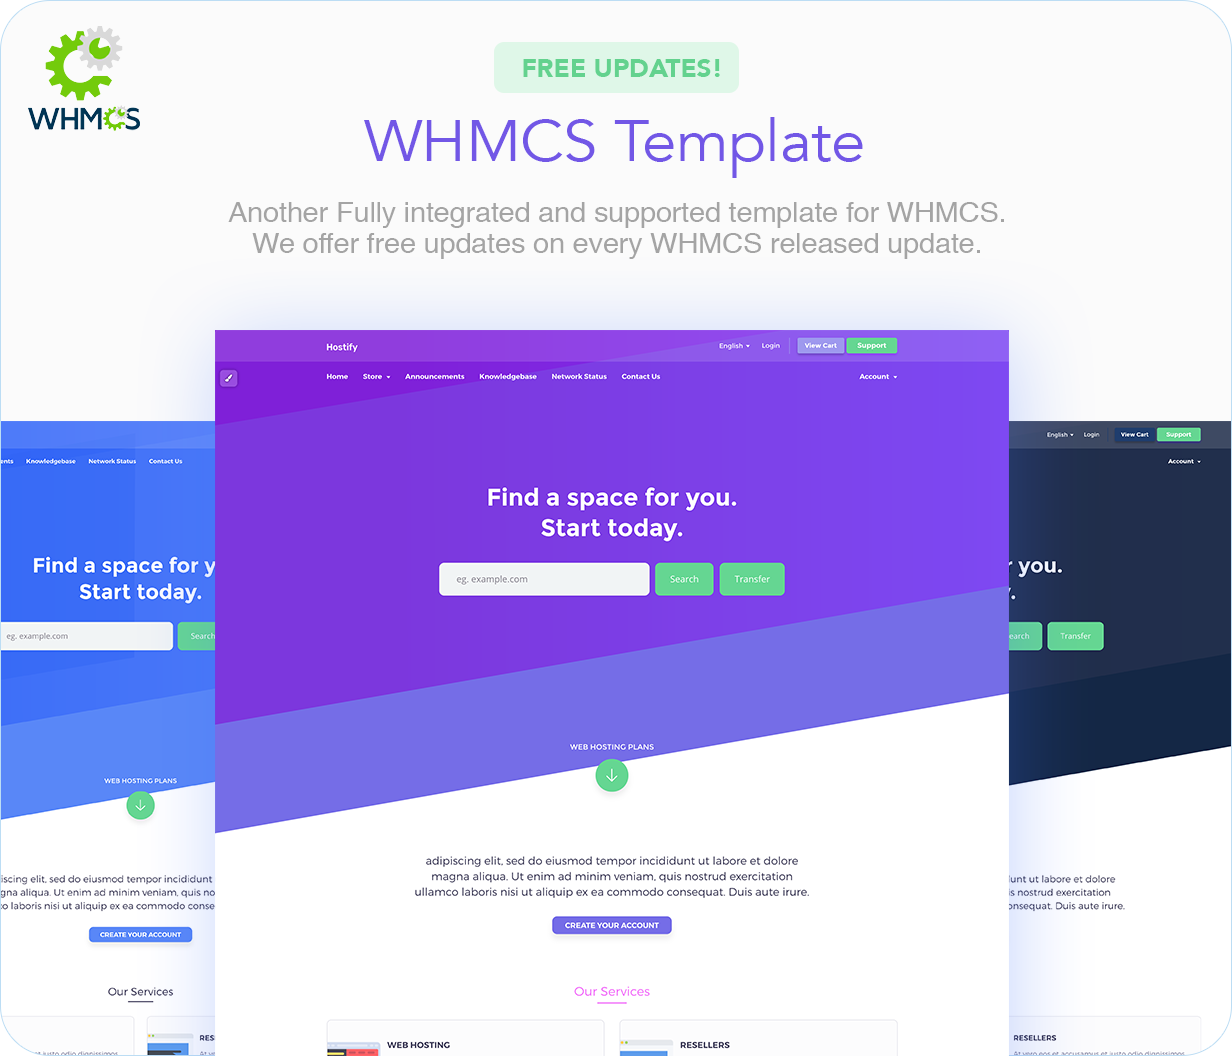 Hostify — Hosting HTML & WHMCS Template | Prosyscom Tech 20